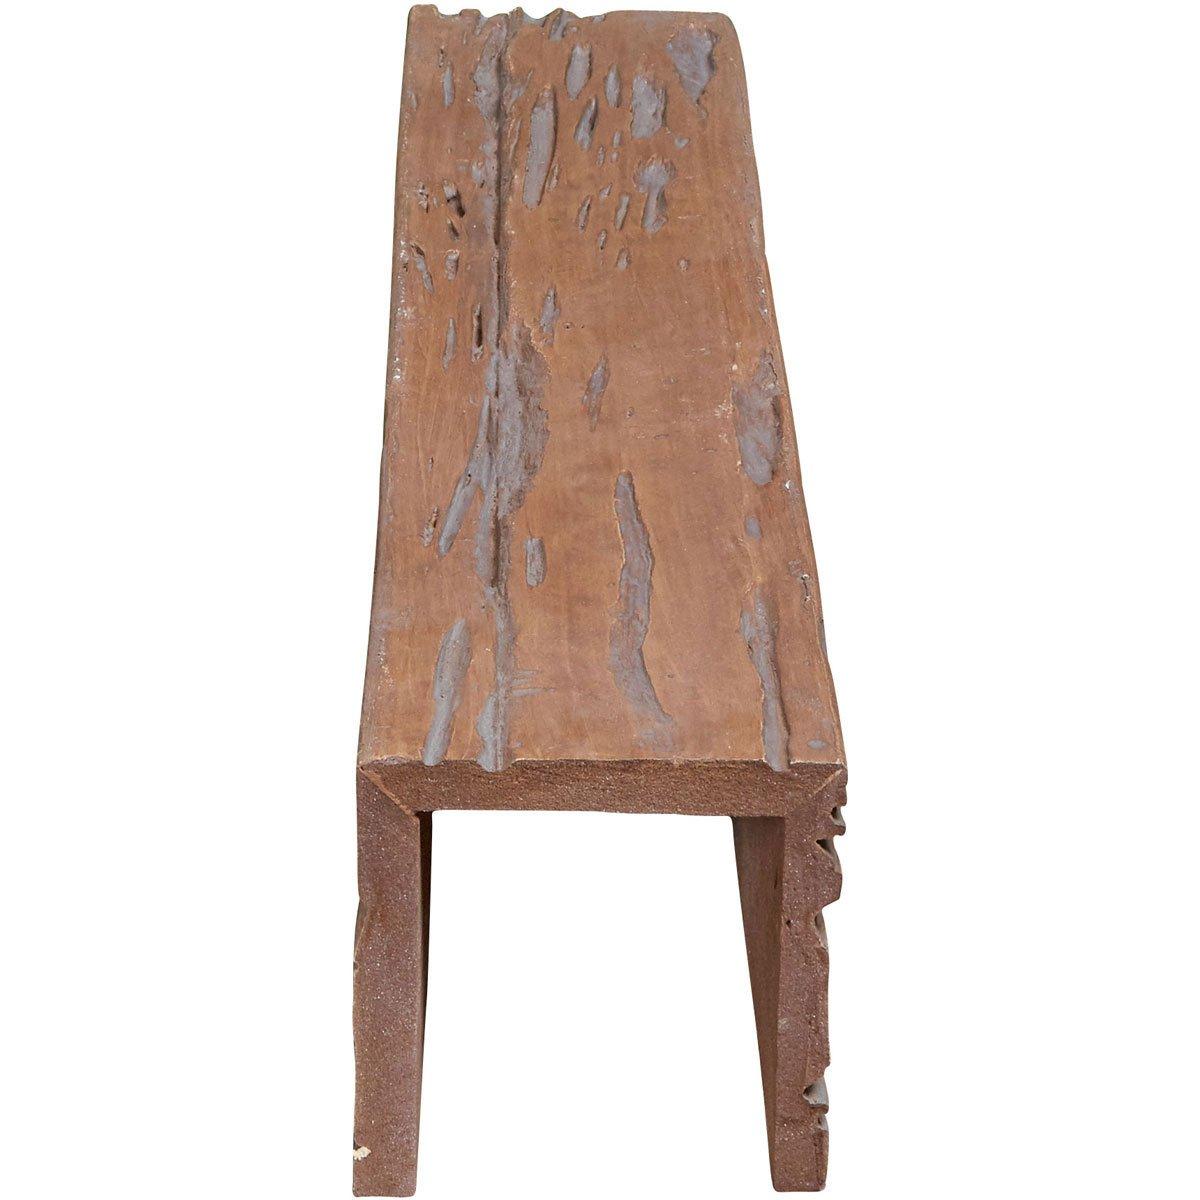 Ekena Millwork BMPC3C0080X060X120PE 8 W x 6 H x 10L 3-Sided U Pecky Cypress Endurathane Faux Wood Ceiling Beam, Pecan, x x